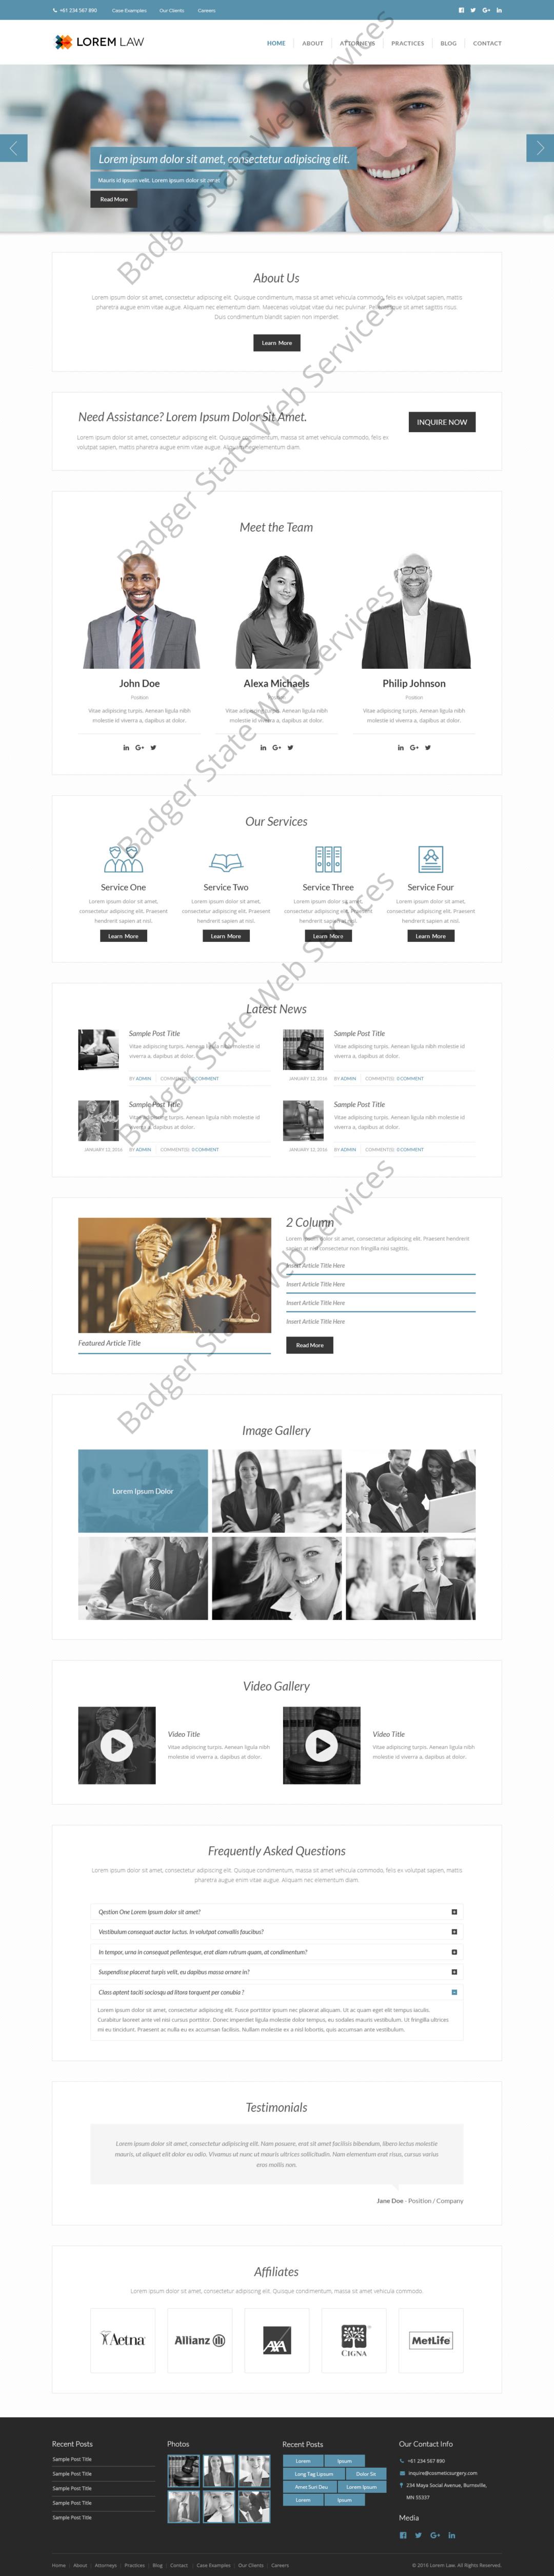 Lawyer Web Design Mockup-L